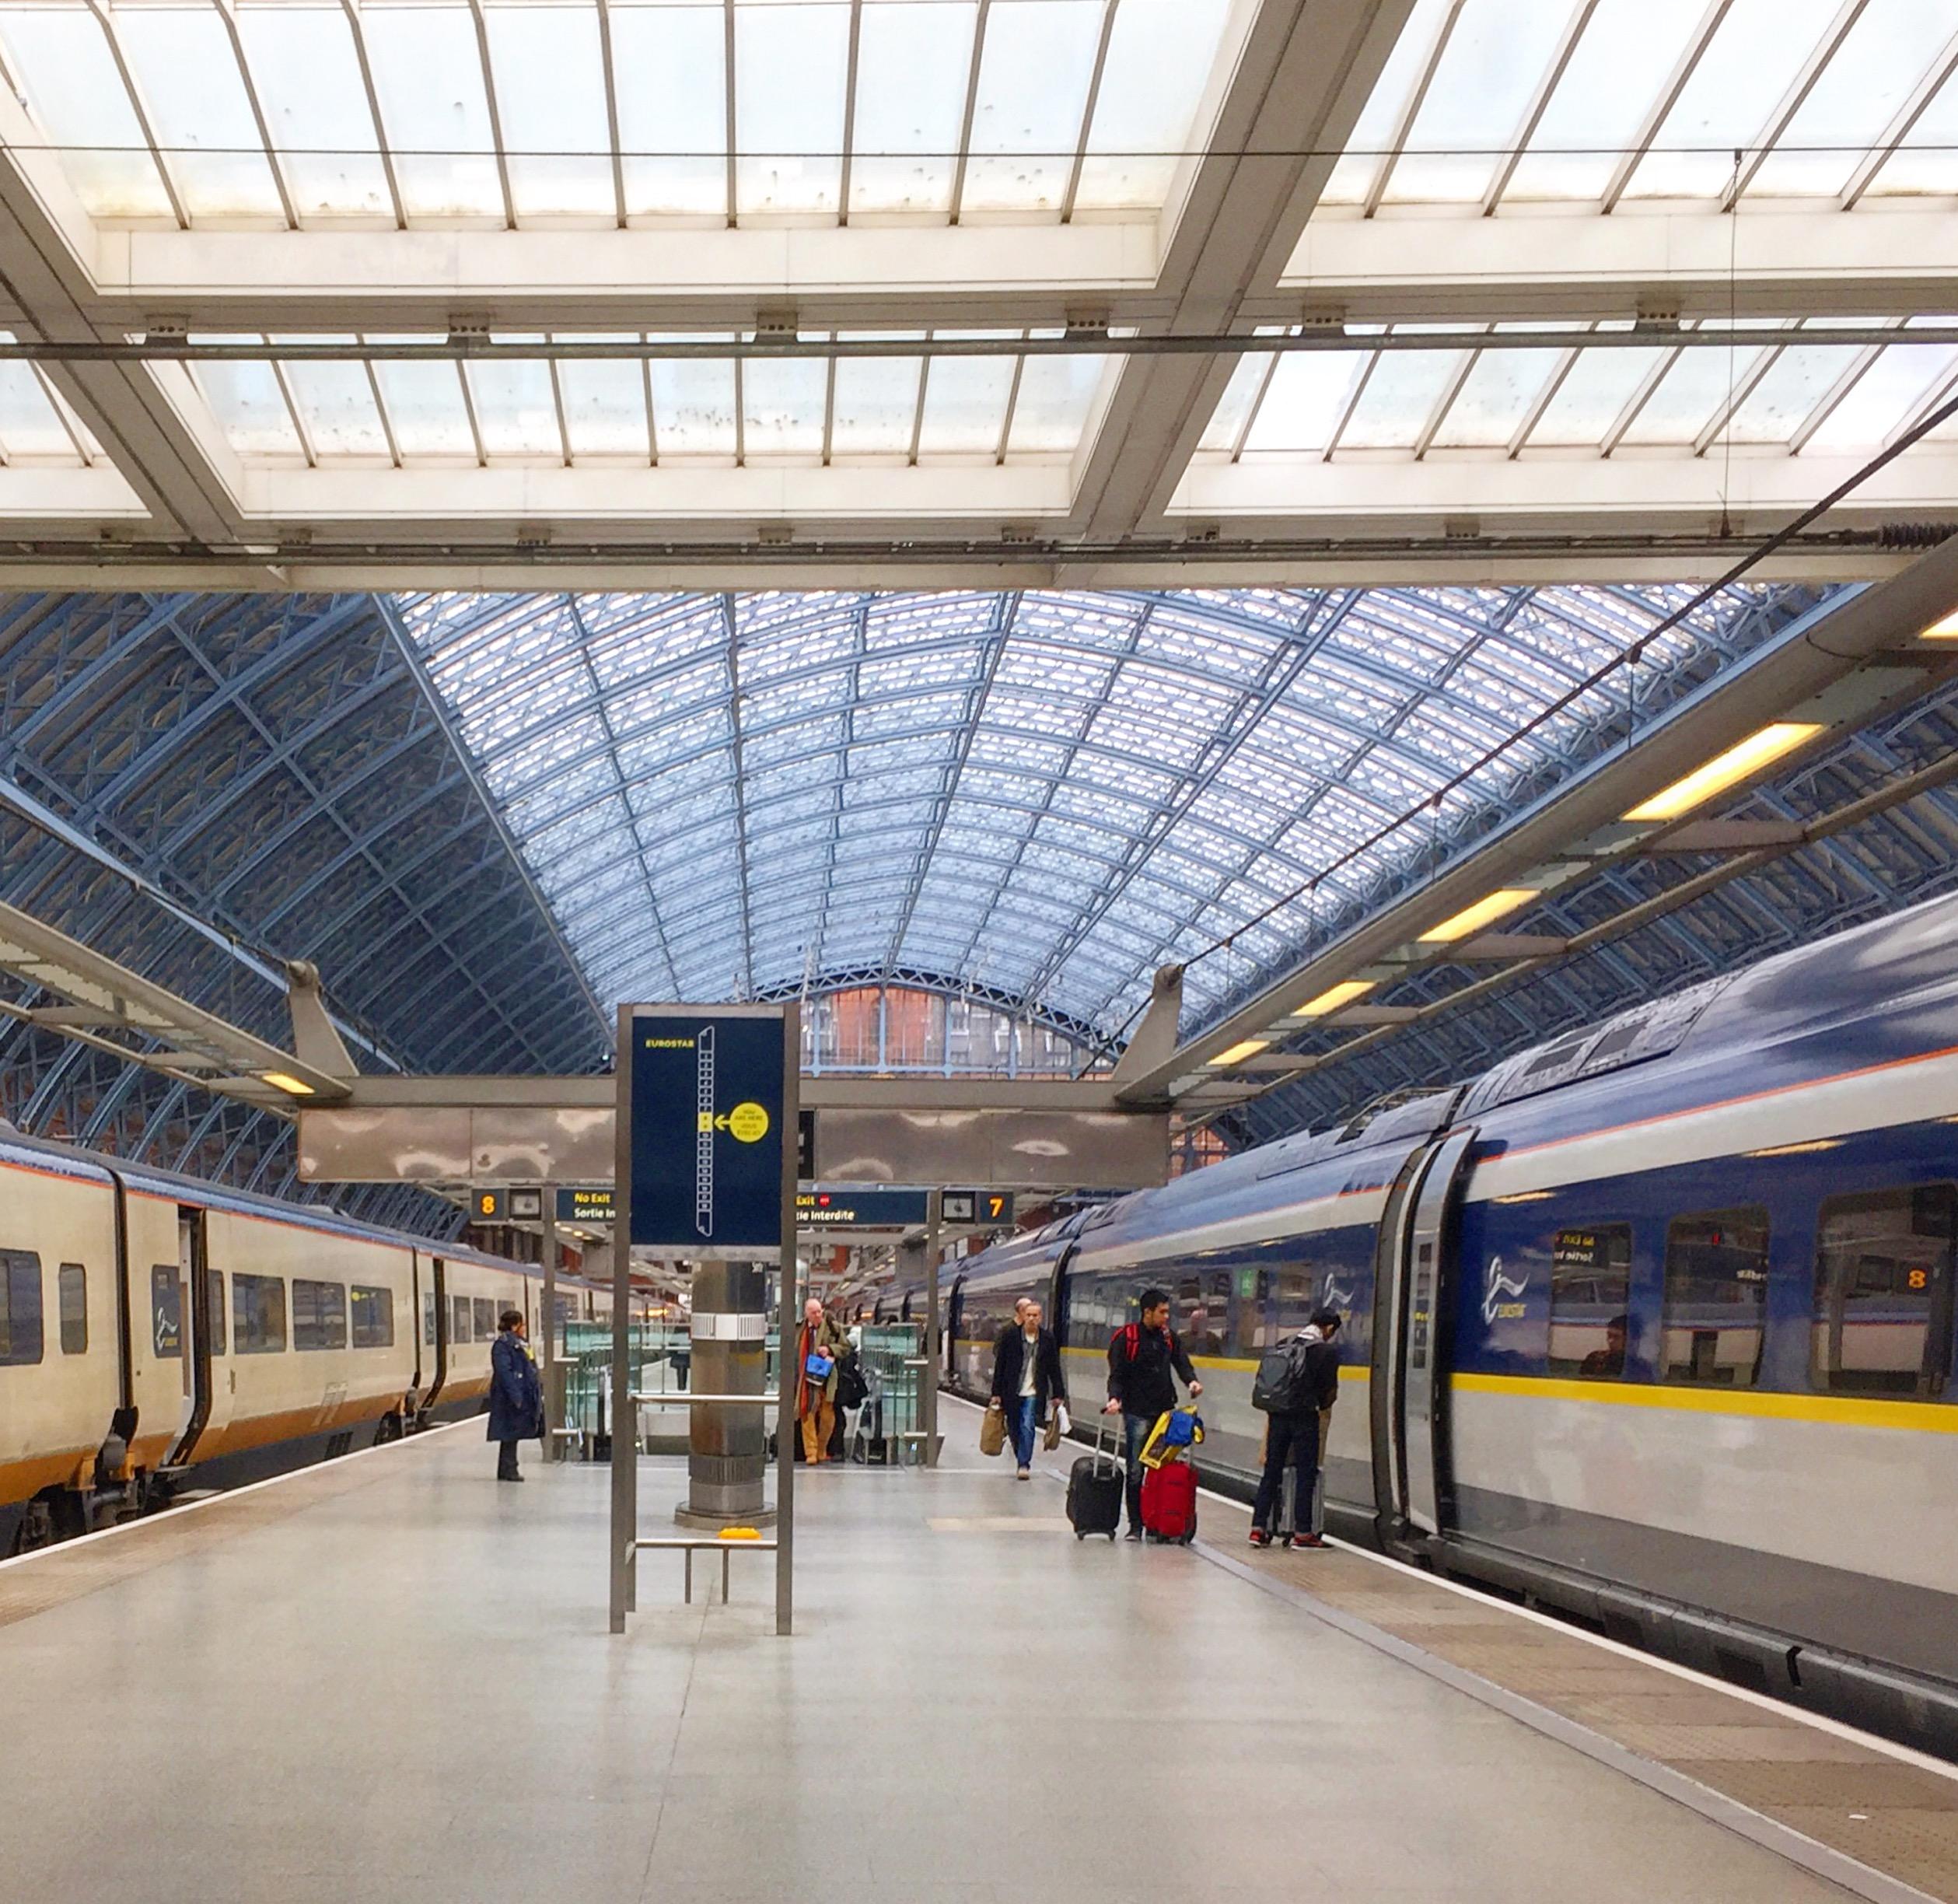 Escape to Europe - Eurostar Train